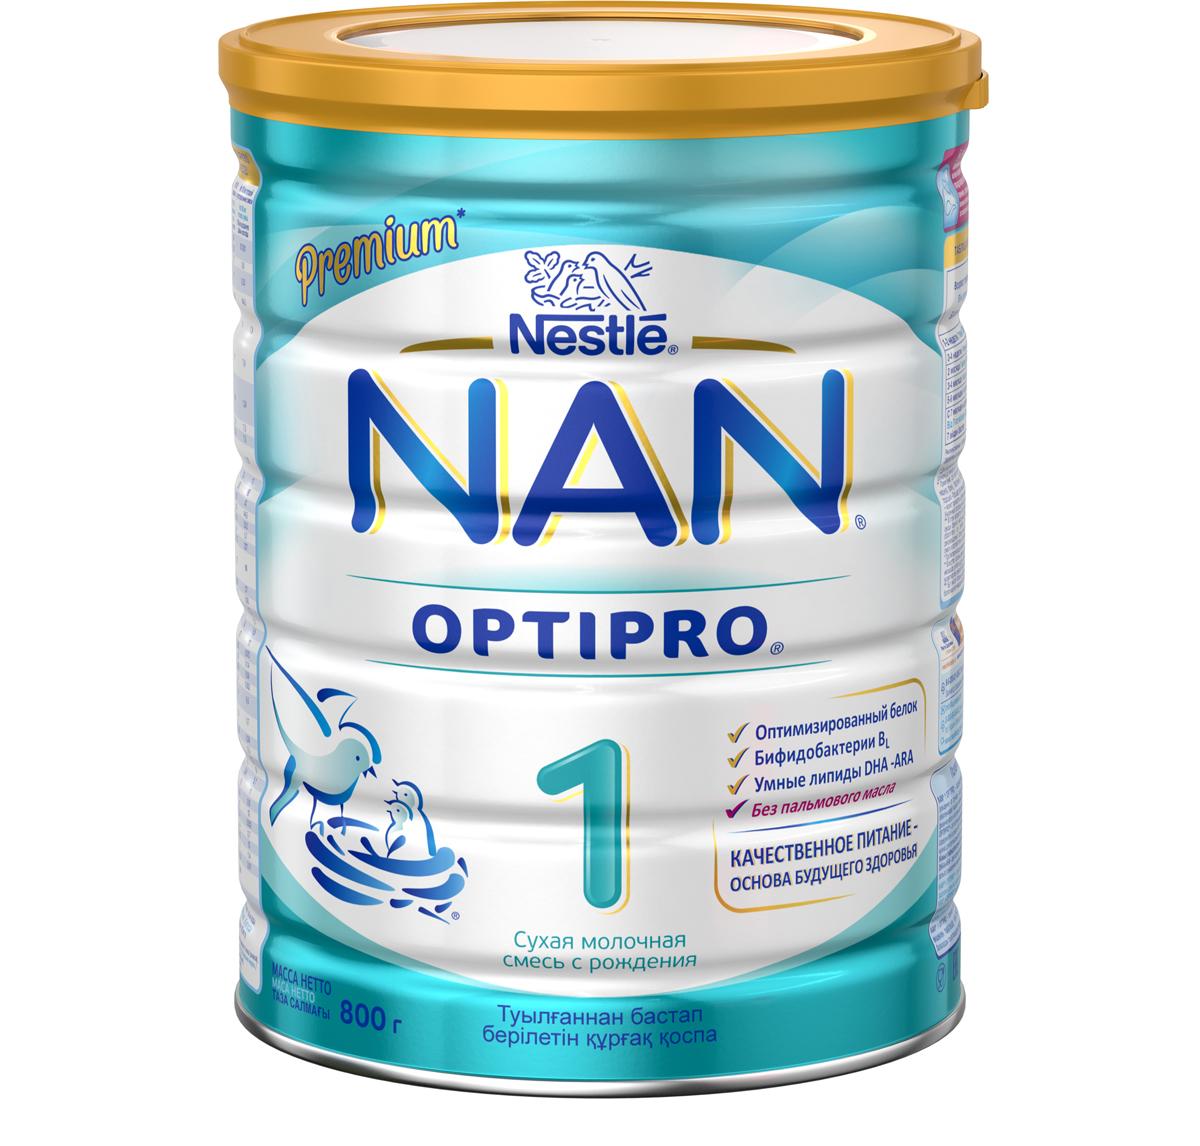 NAN 1 OPTIPRO смесь молочная, с рождения 800 г молочная смесь nan антиколики с рождения 400 г